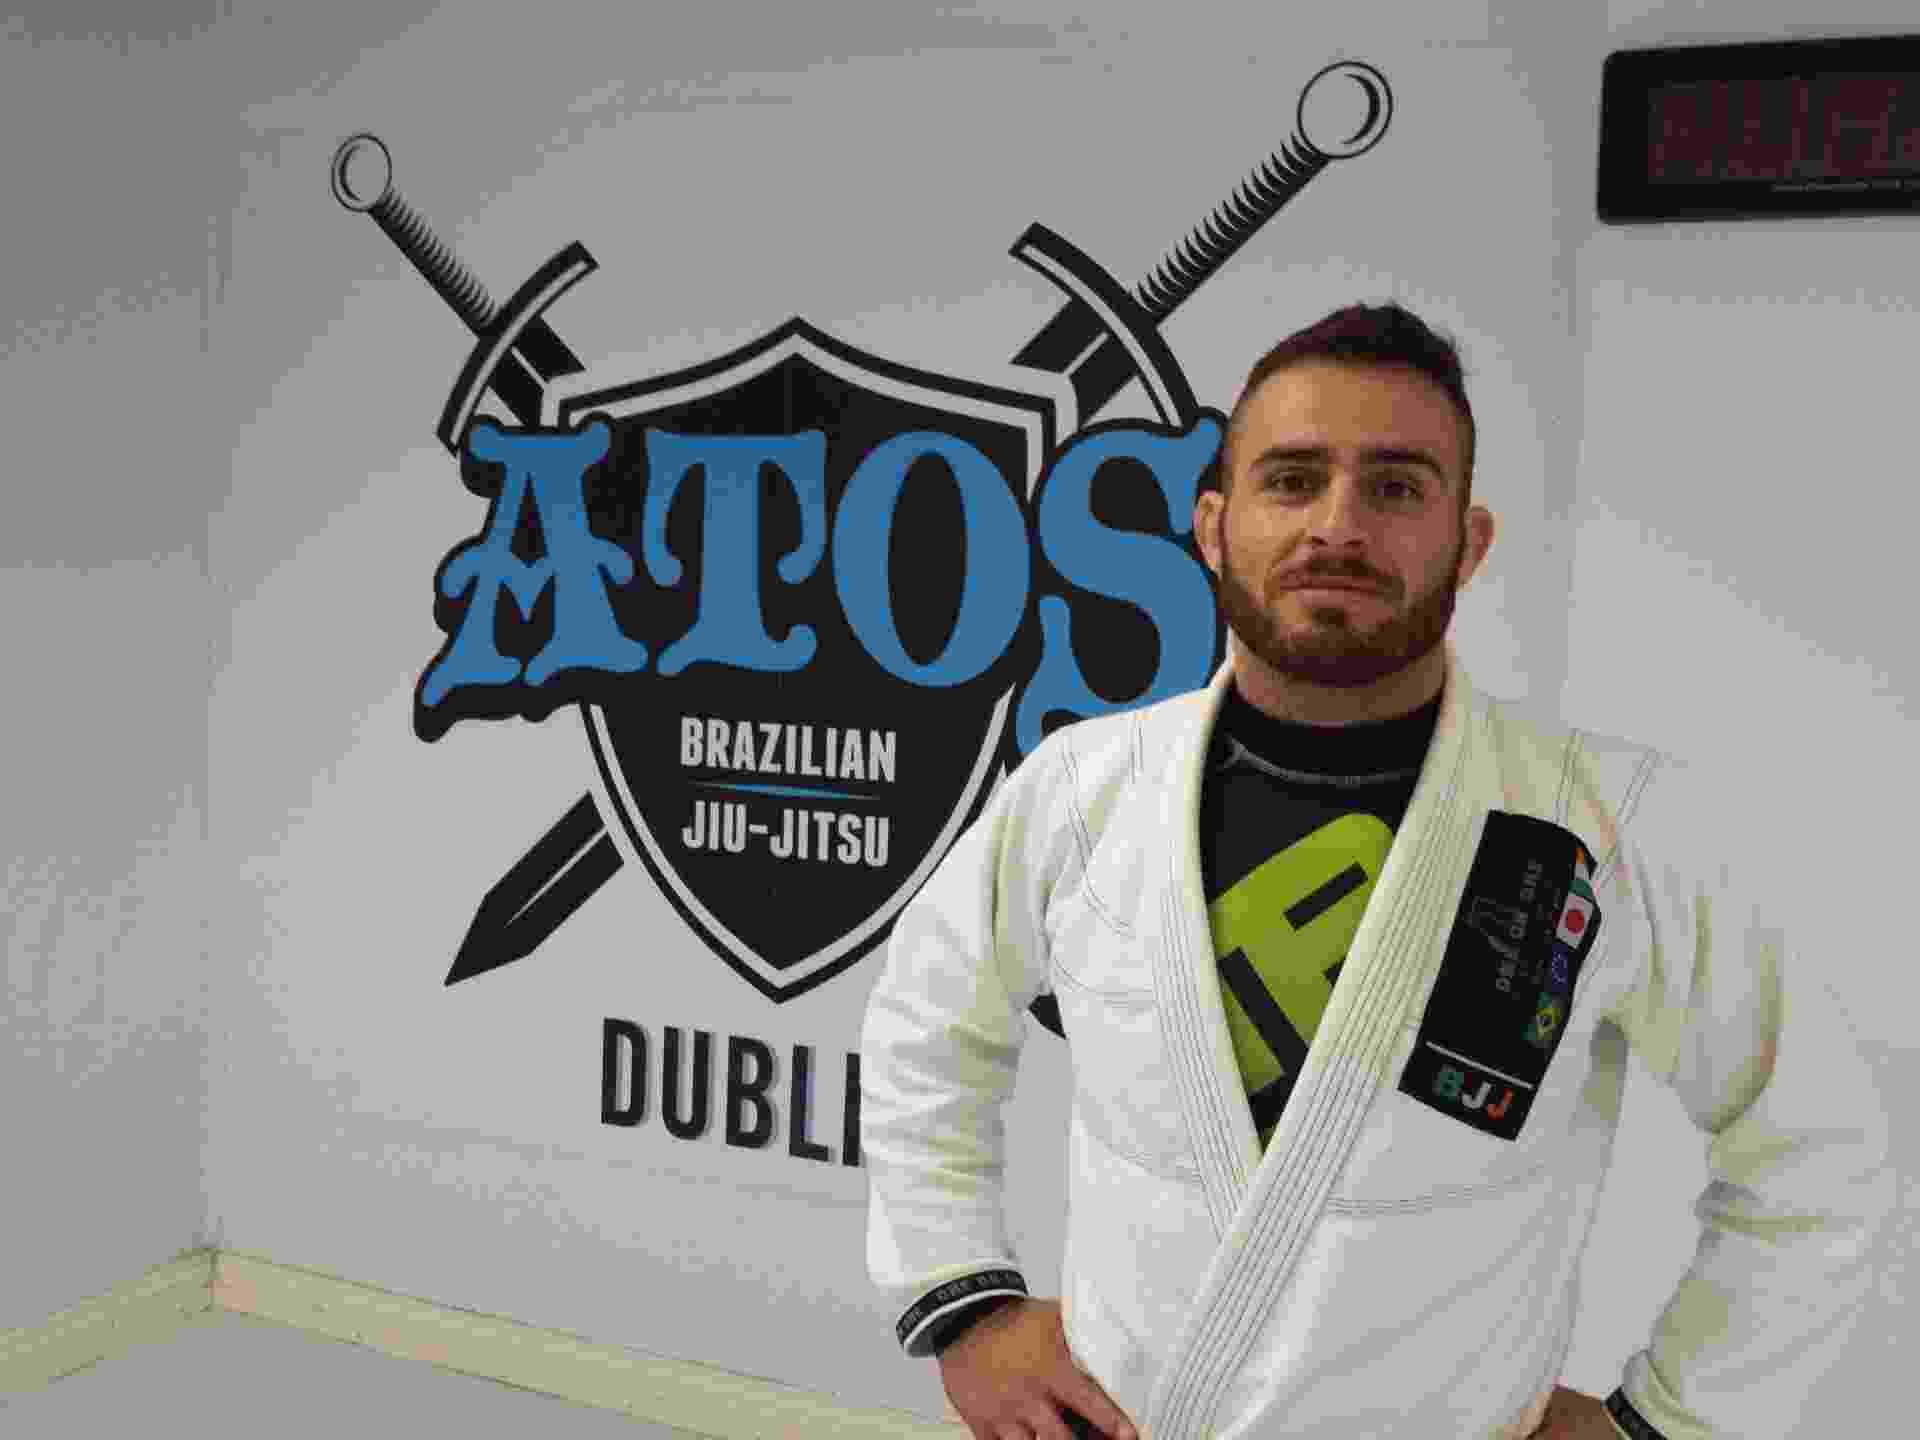 Academia Jorge Santos de jiu-jitsu na Irlanda - Flávio Carneiro/UOL